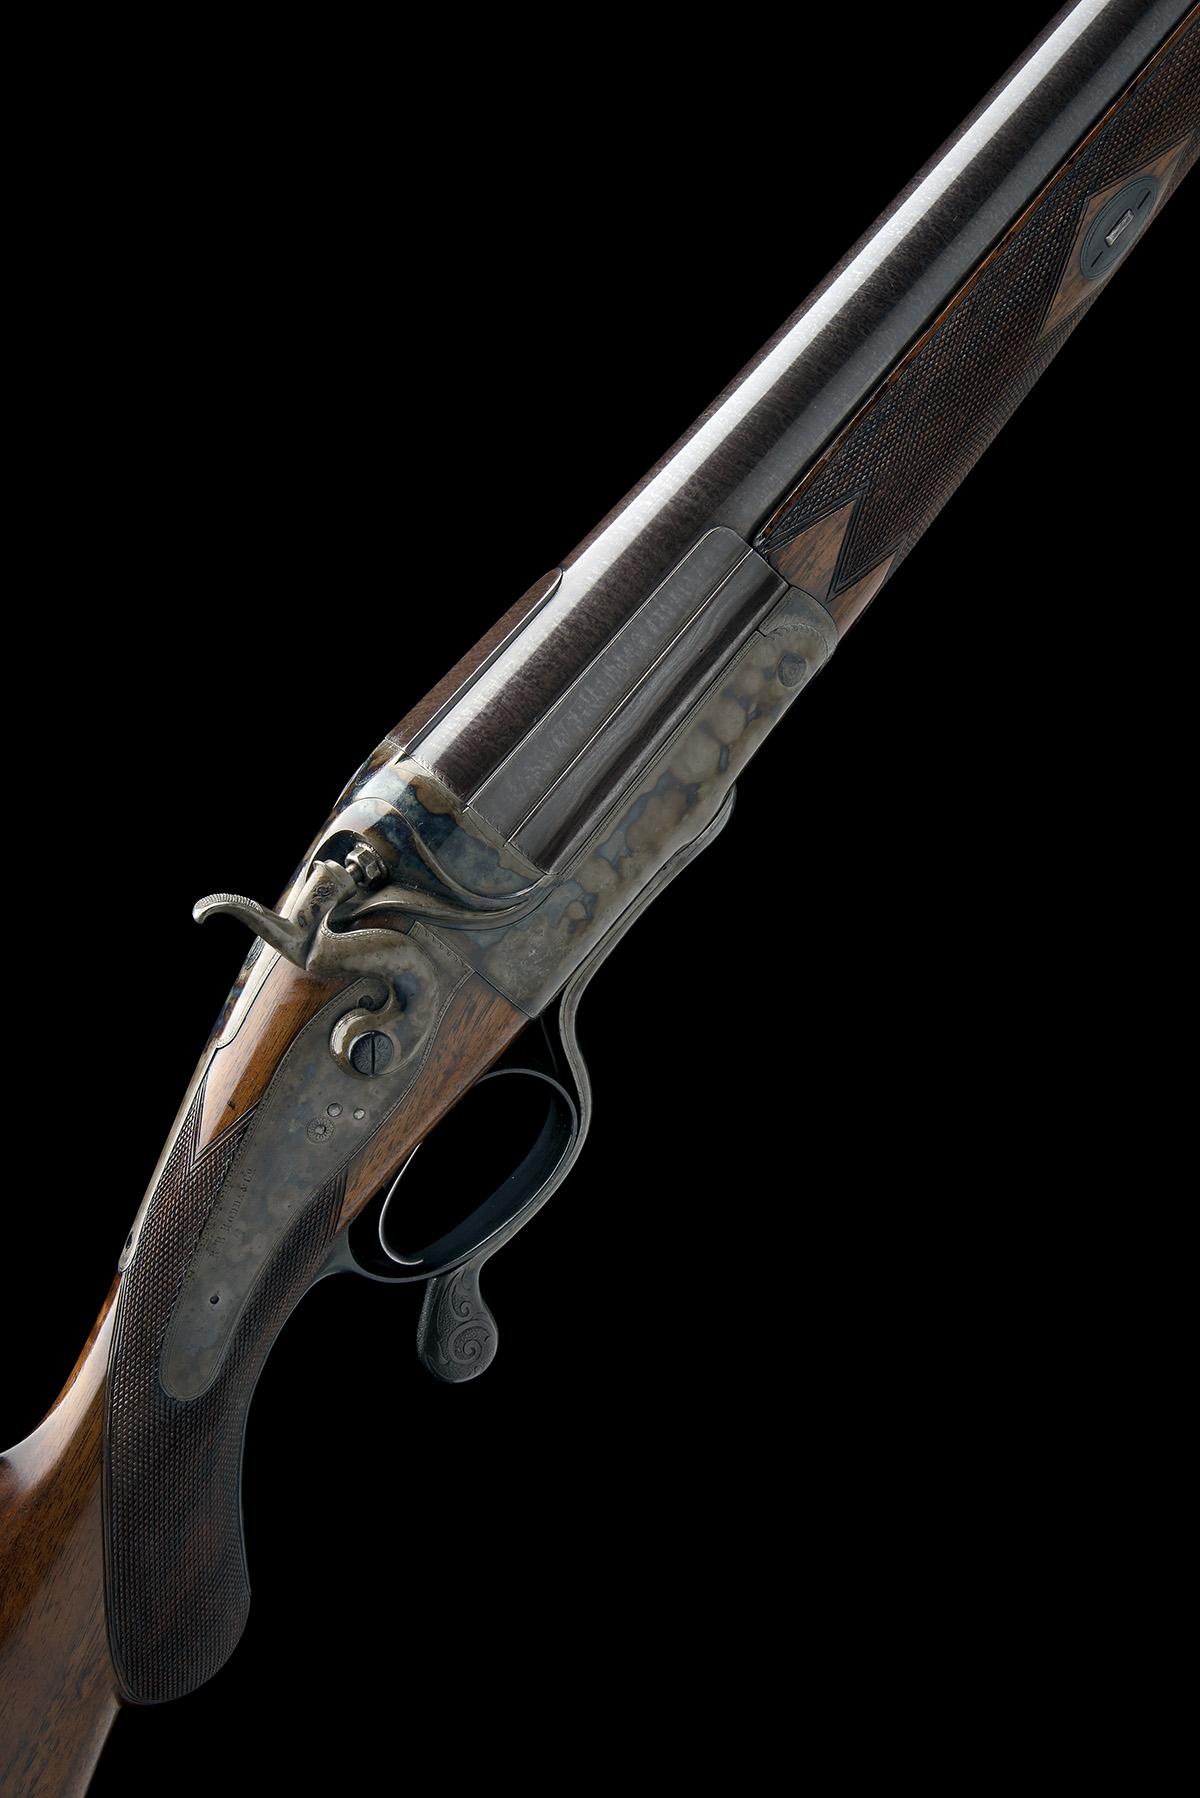 R.B. RODDA A 4-BORE SINGLE-BARRELLED ROTARY-UNDERLEVER HAMMERGUN, serial no. 26013, circa 1880, 38